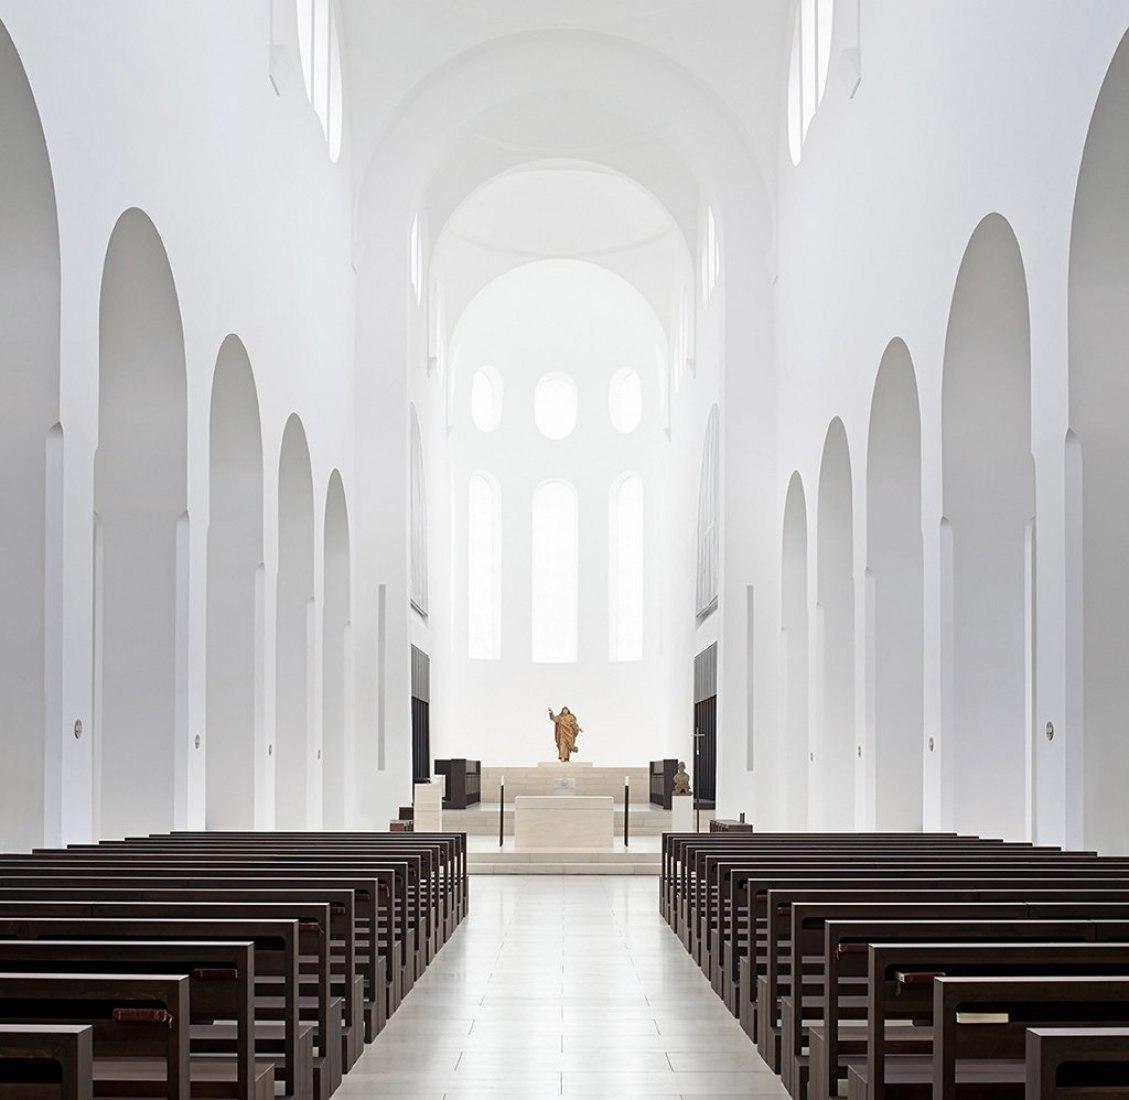 St. Moritz Church by John Pawson. Photography © Hufton+Crow